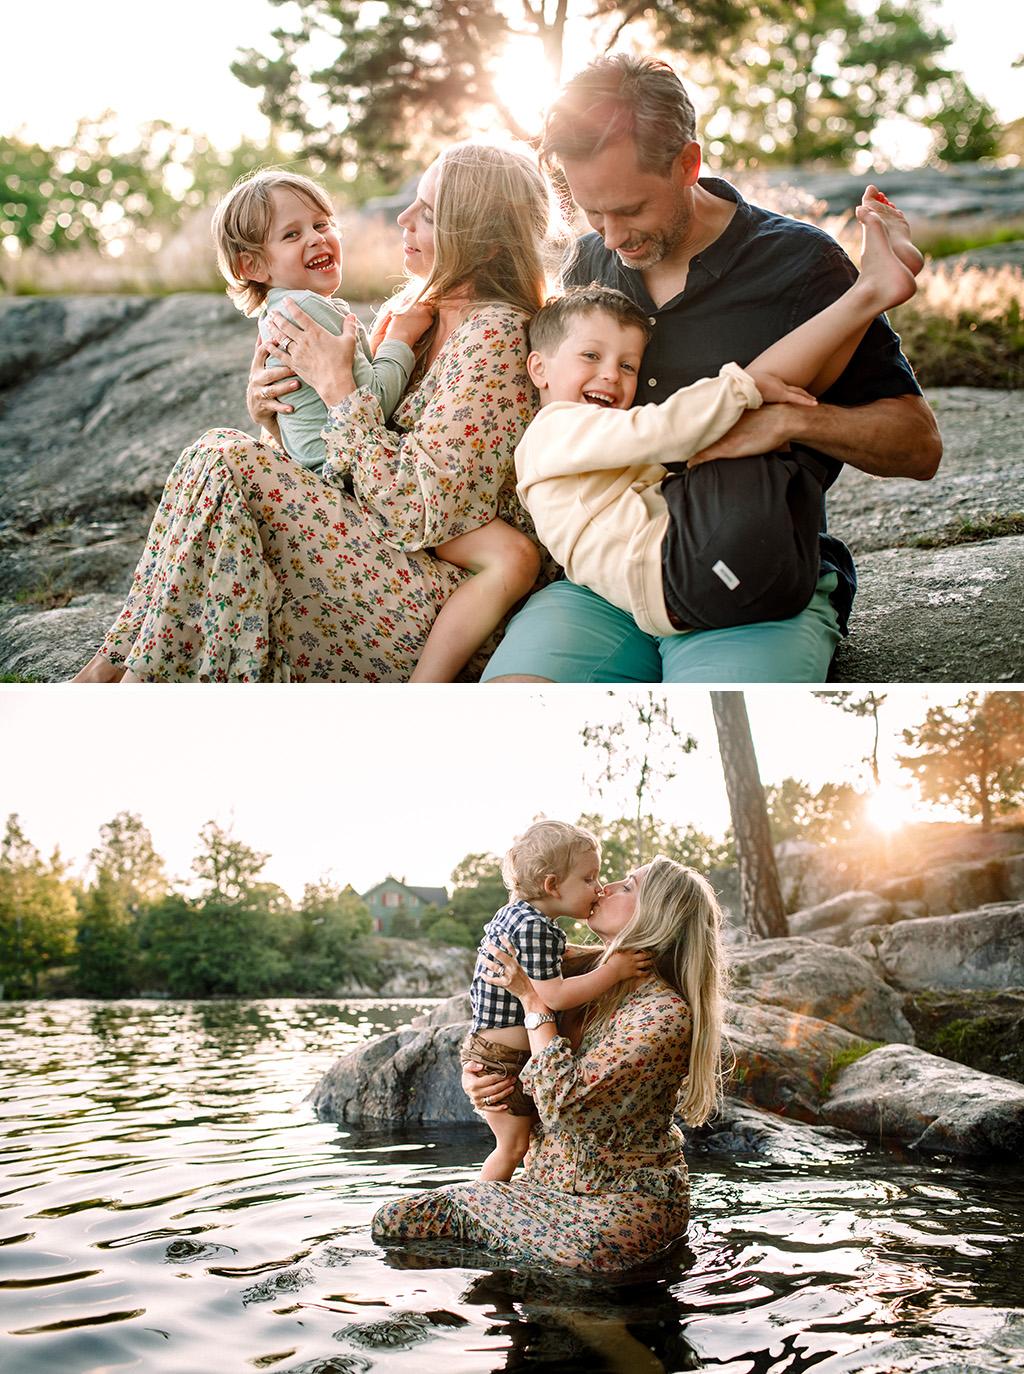 Hav-land_Fine-Art_Familjefotografering-i-vattnet_Stockholm-5.jpg